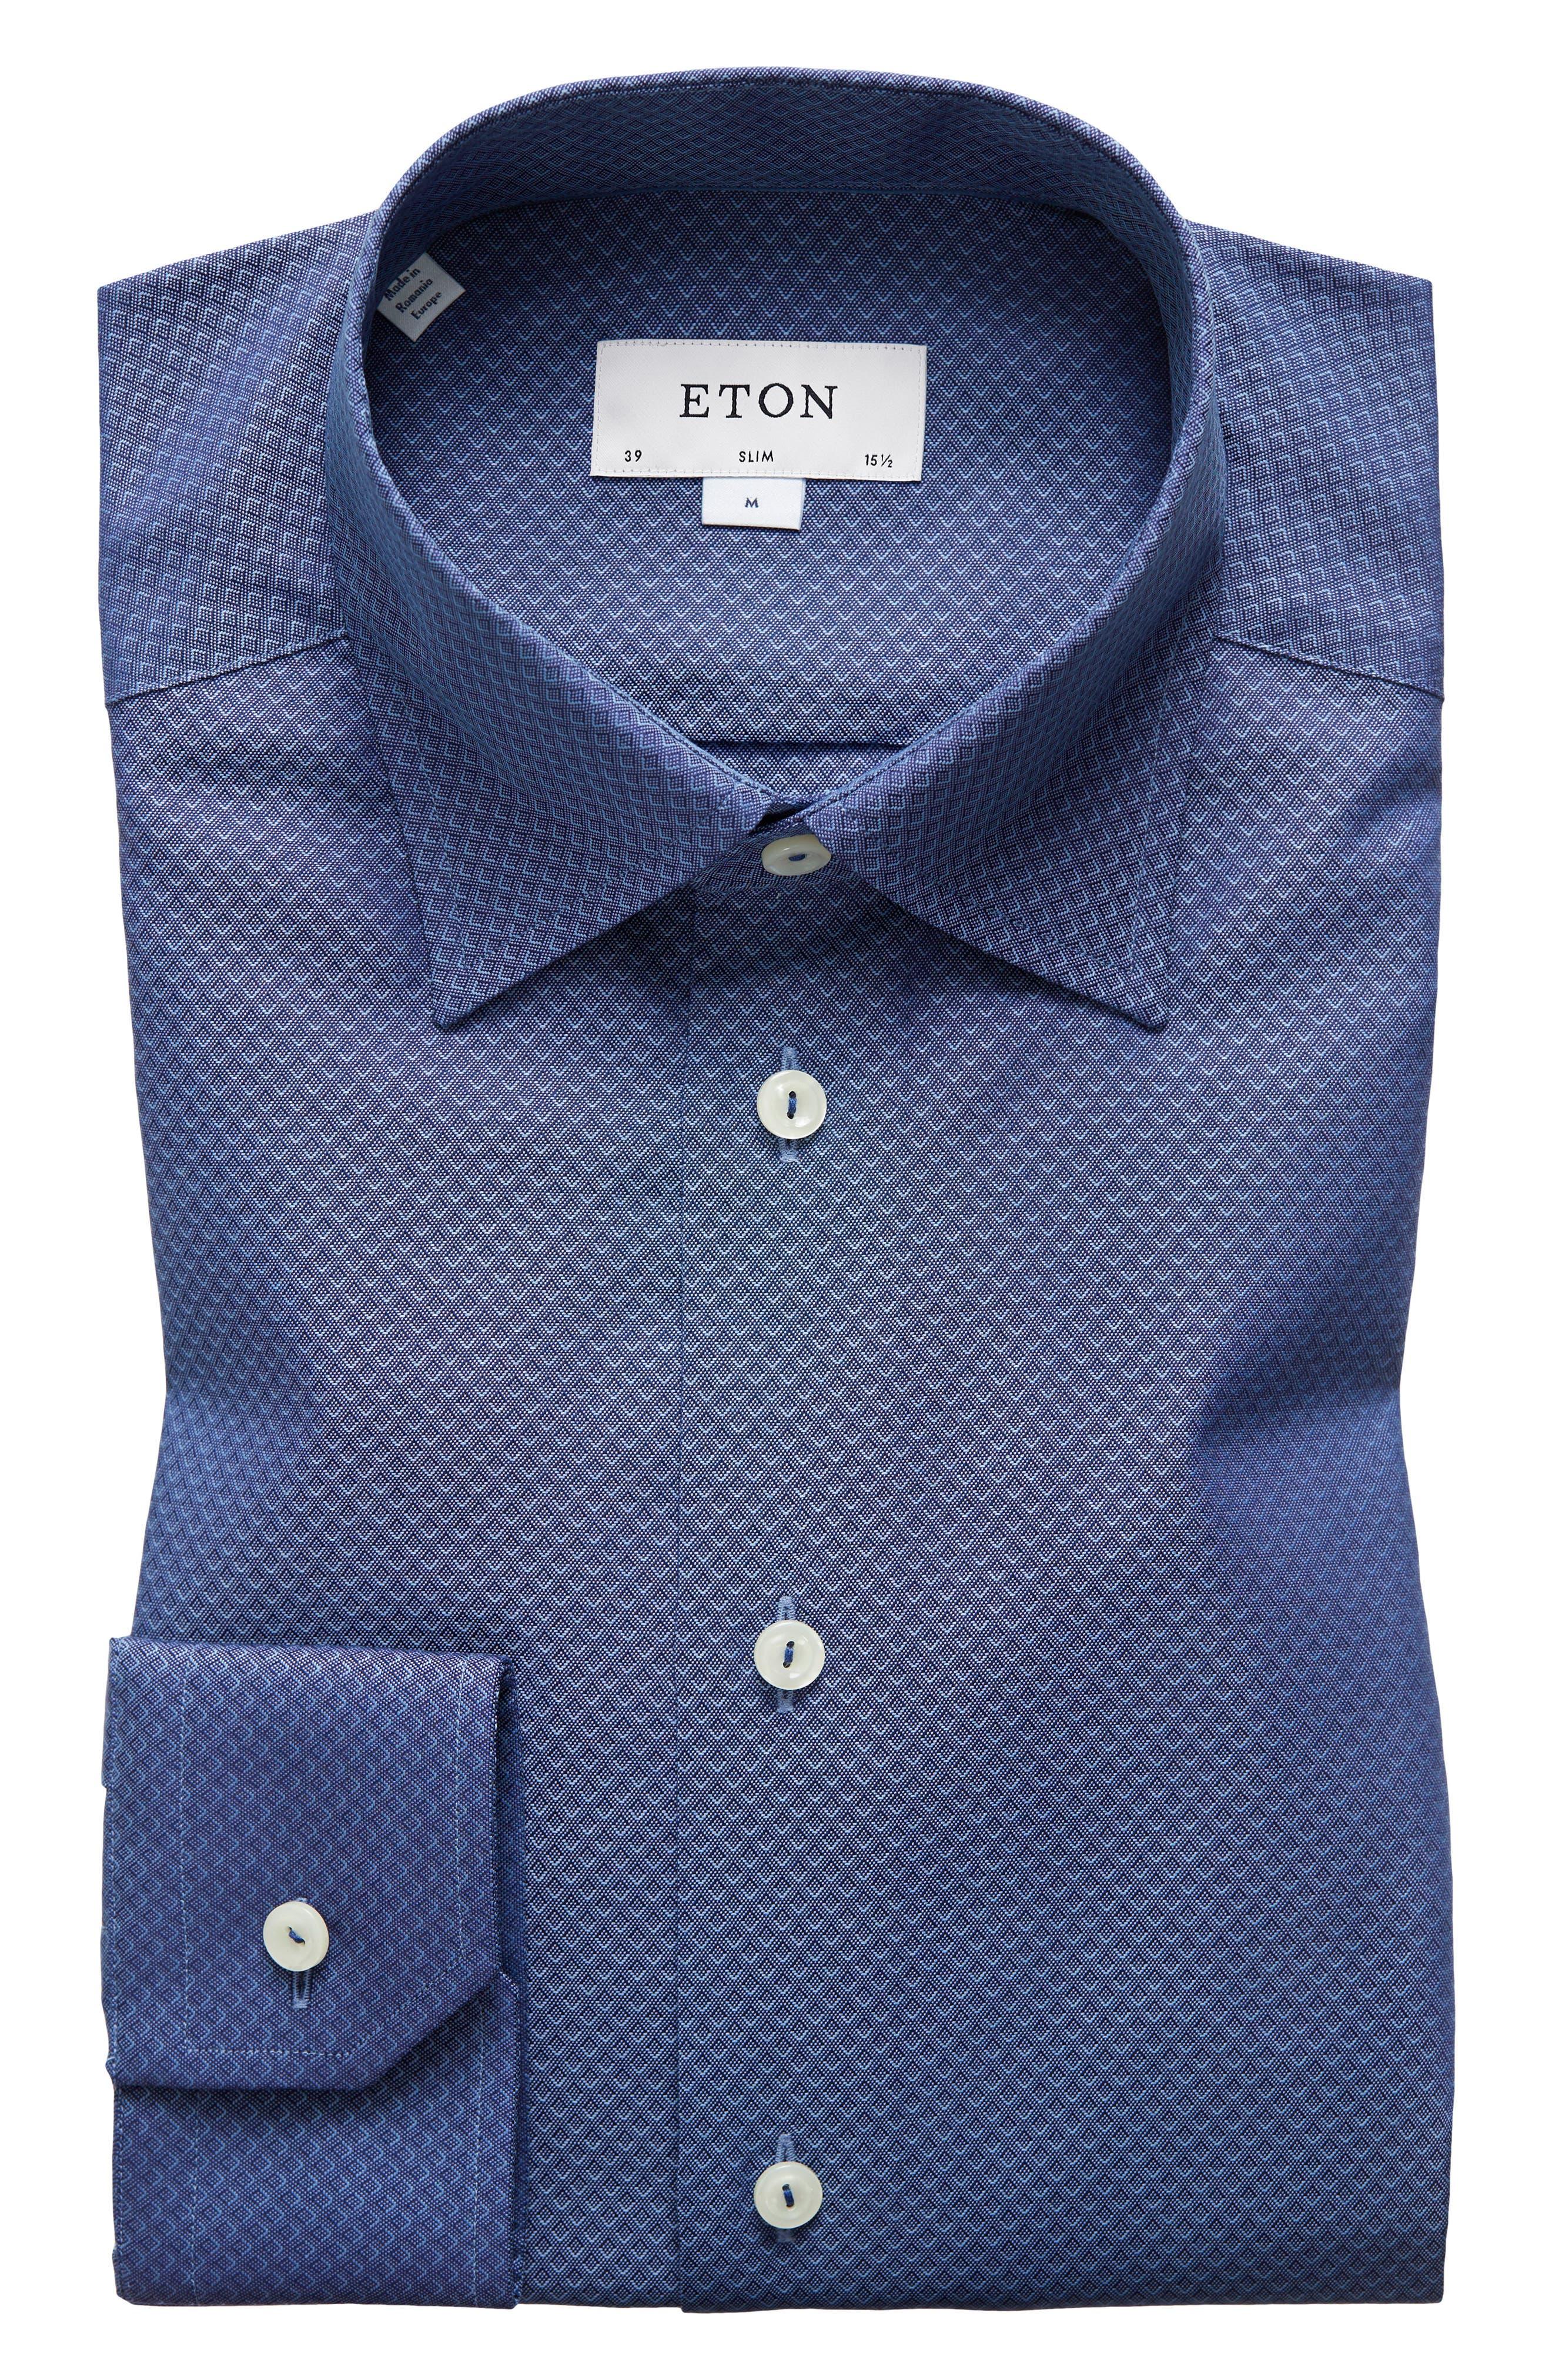 Eton Slim Fit Diamond Print Dress Shirt